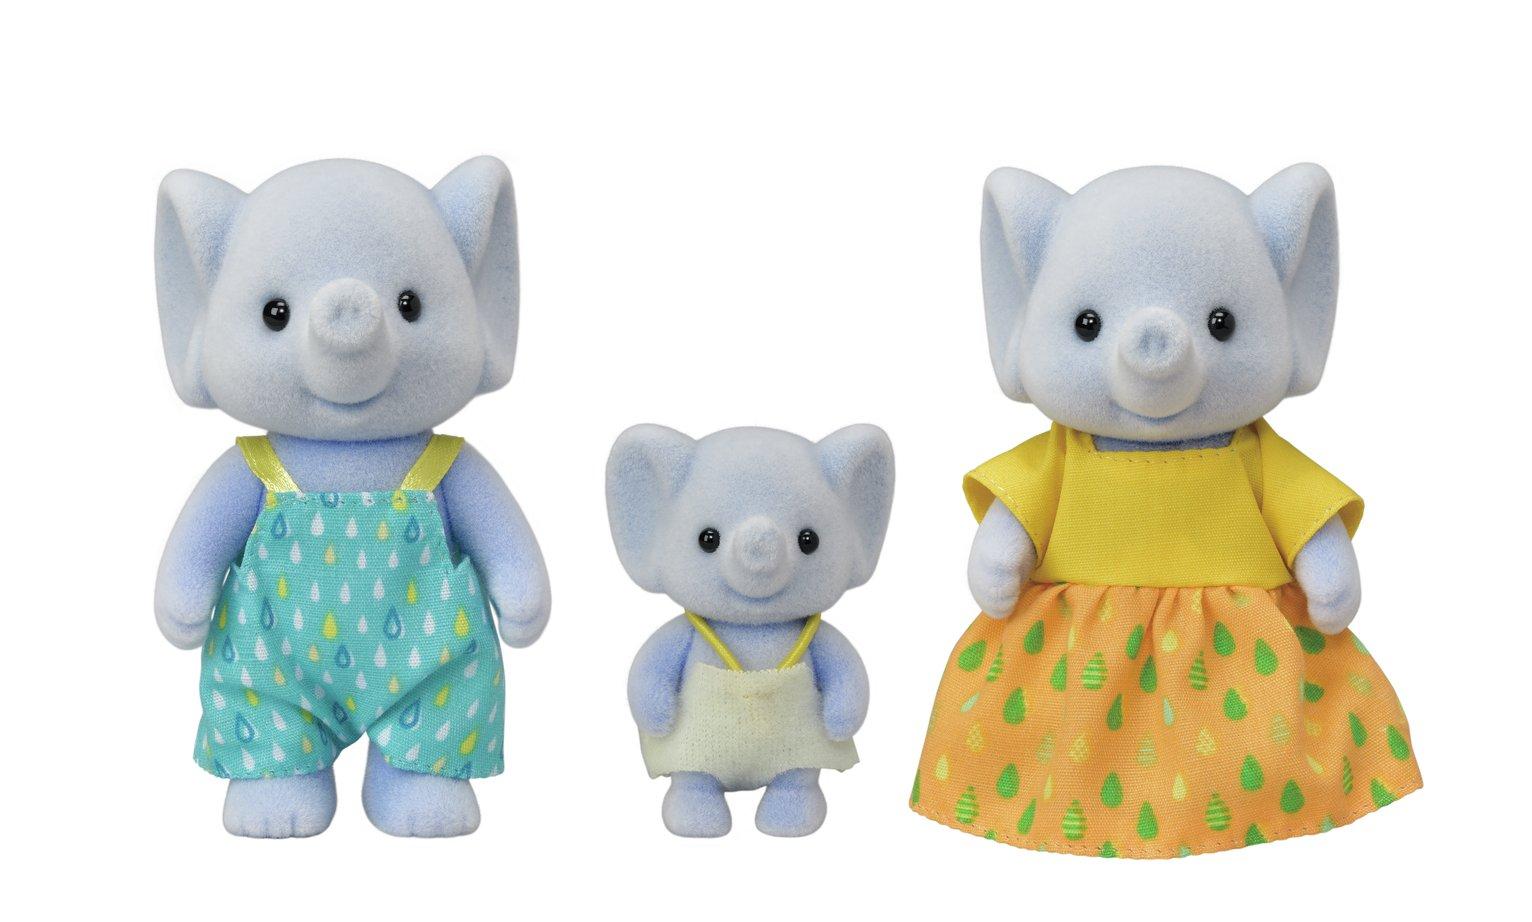 Sylvanian Families Elephant Family Playset